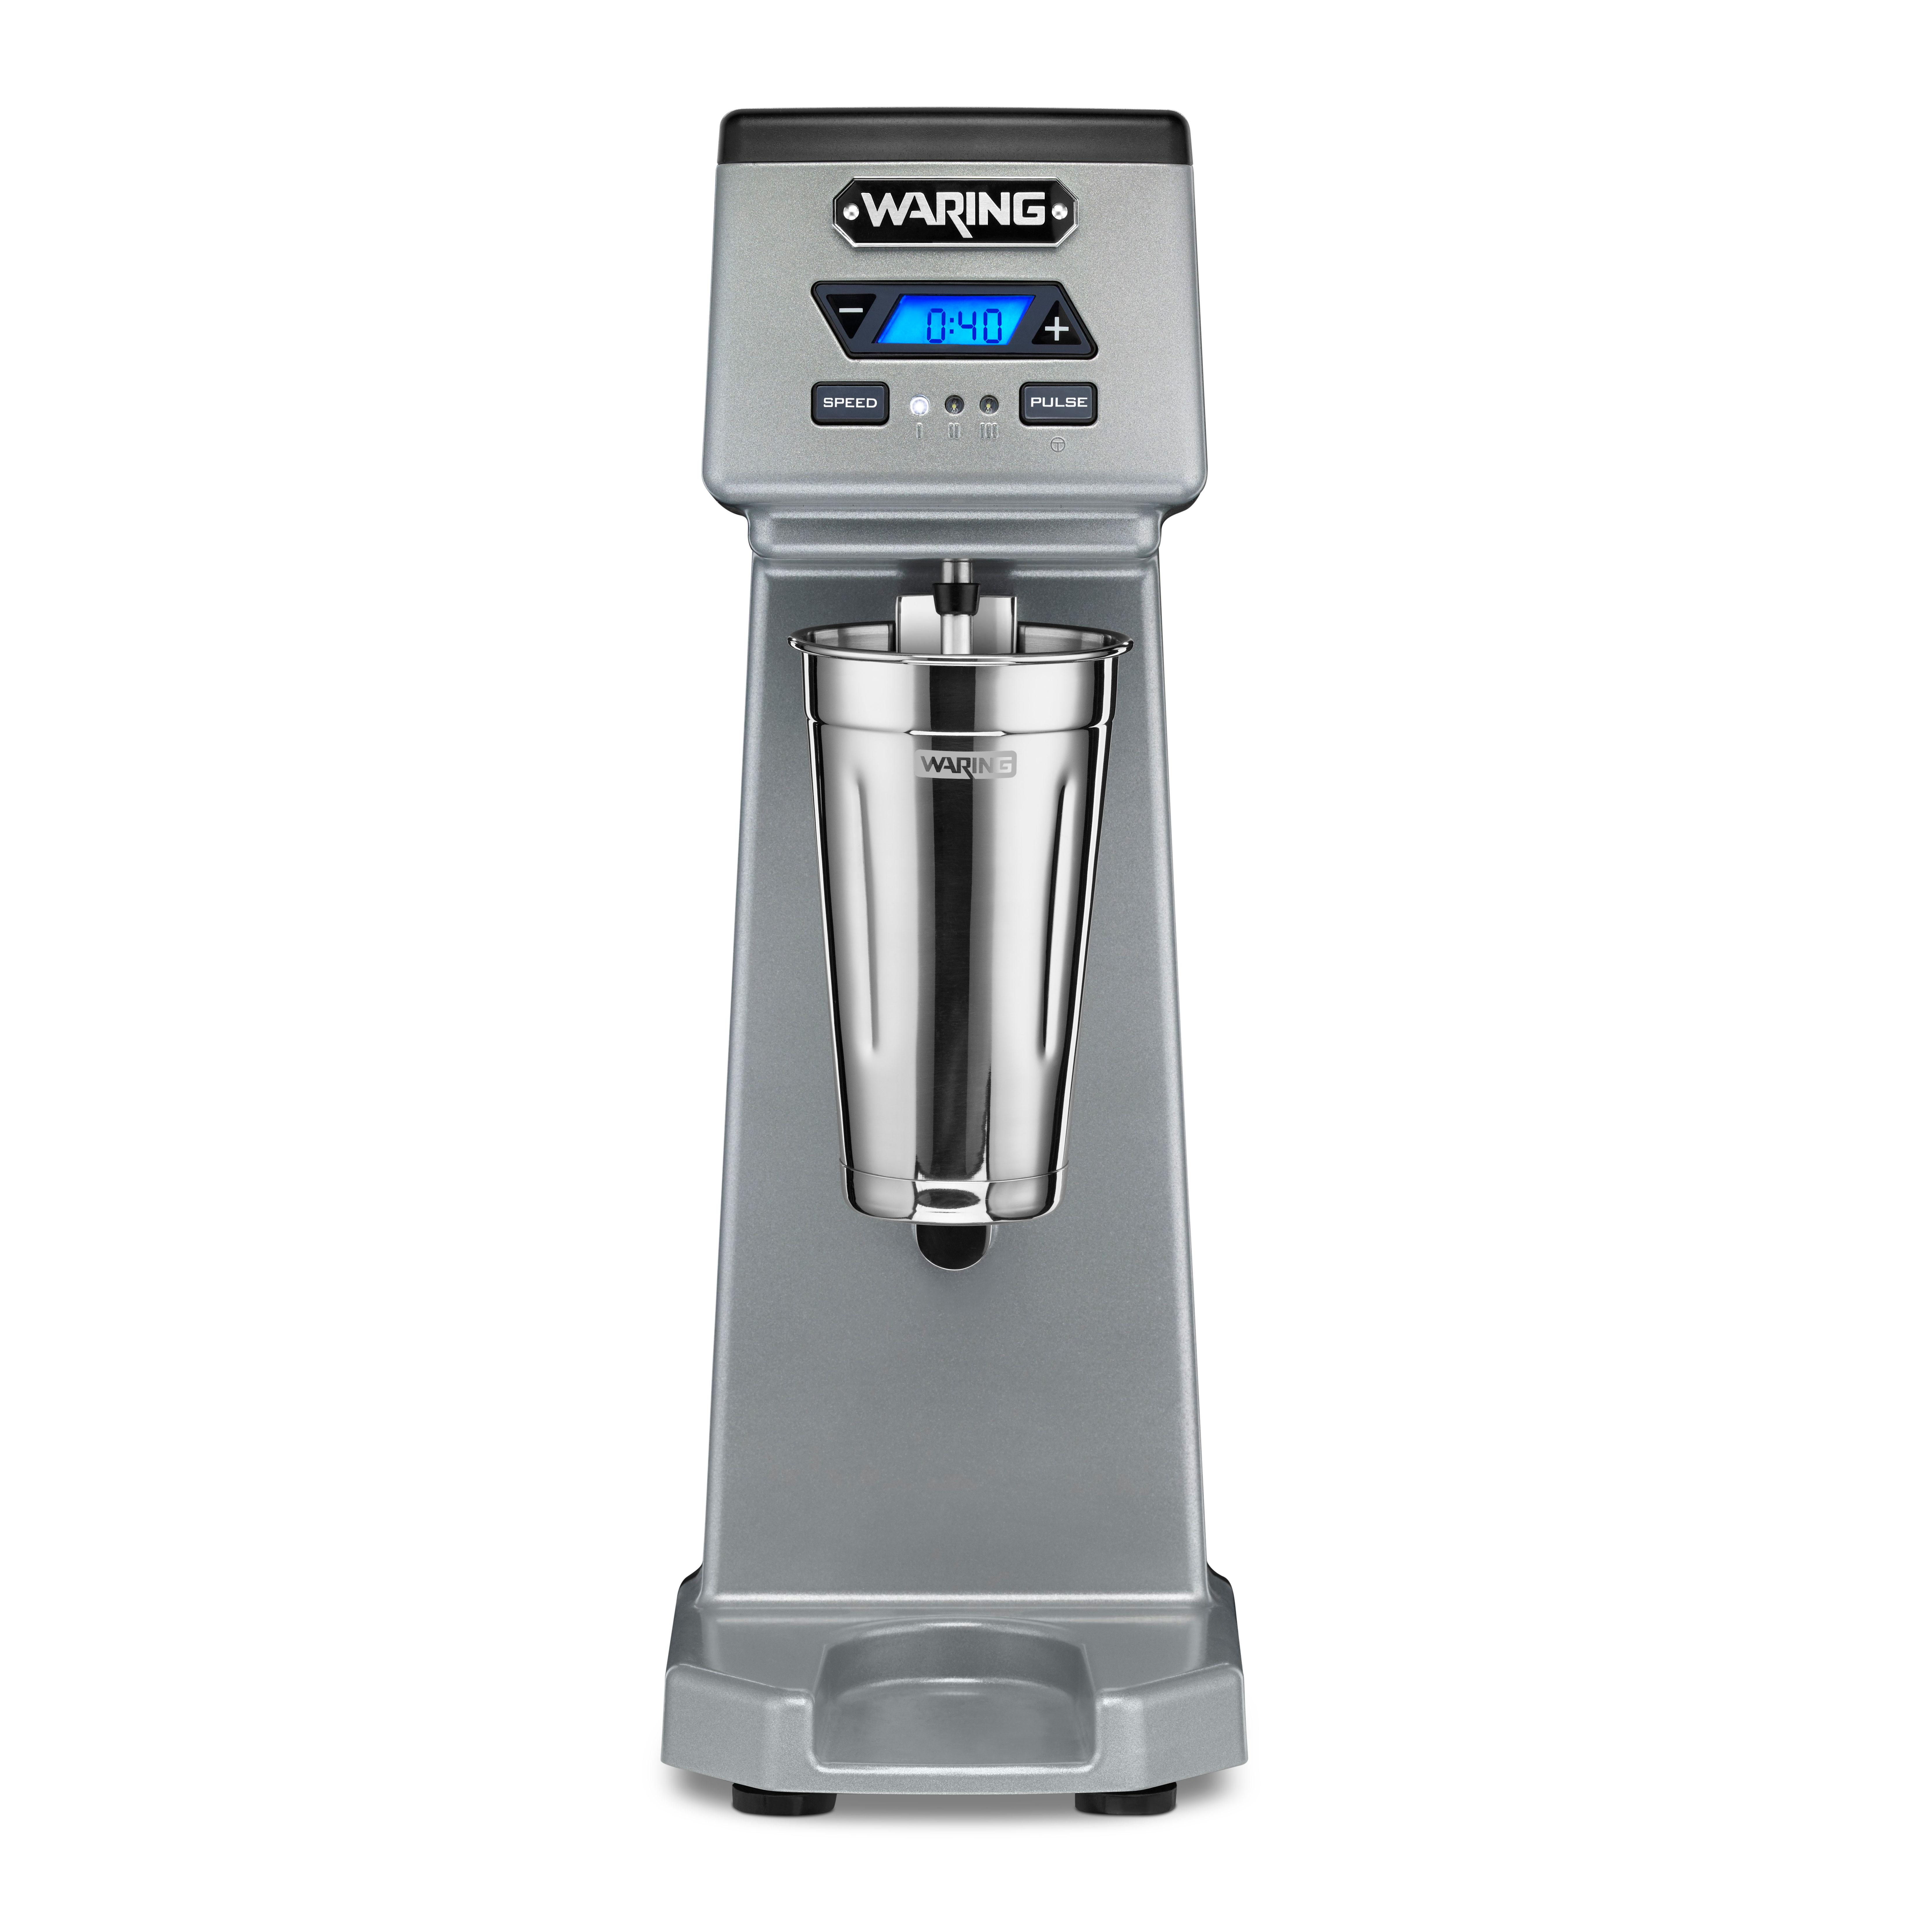 Waring WDM120TX mixer, drink / bar